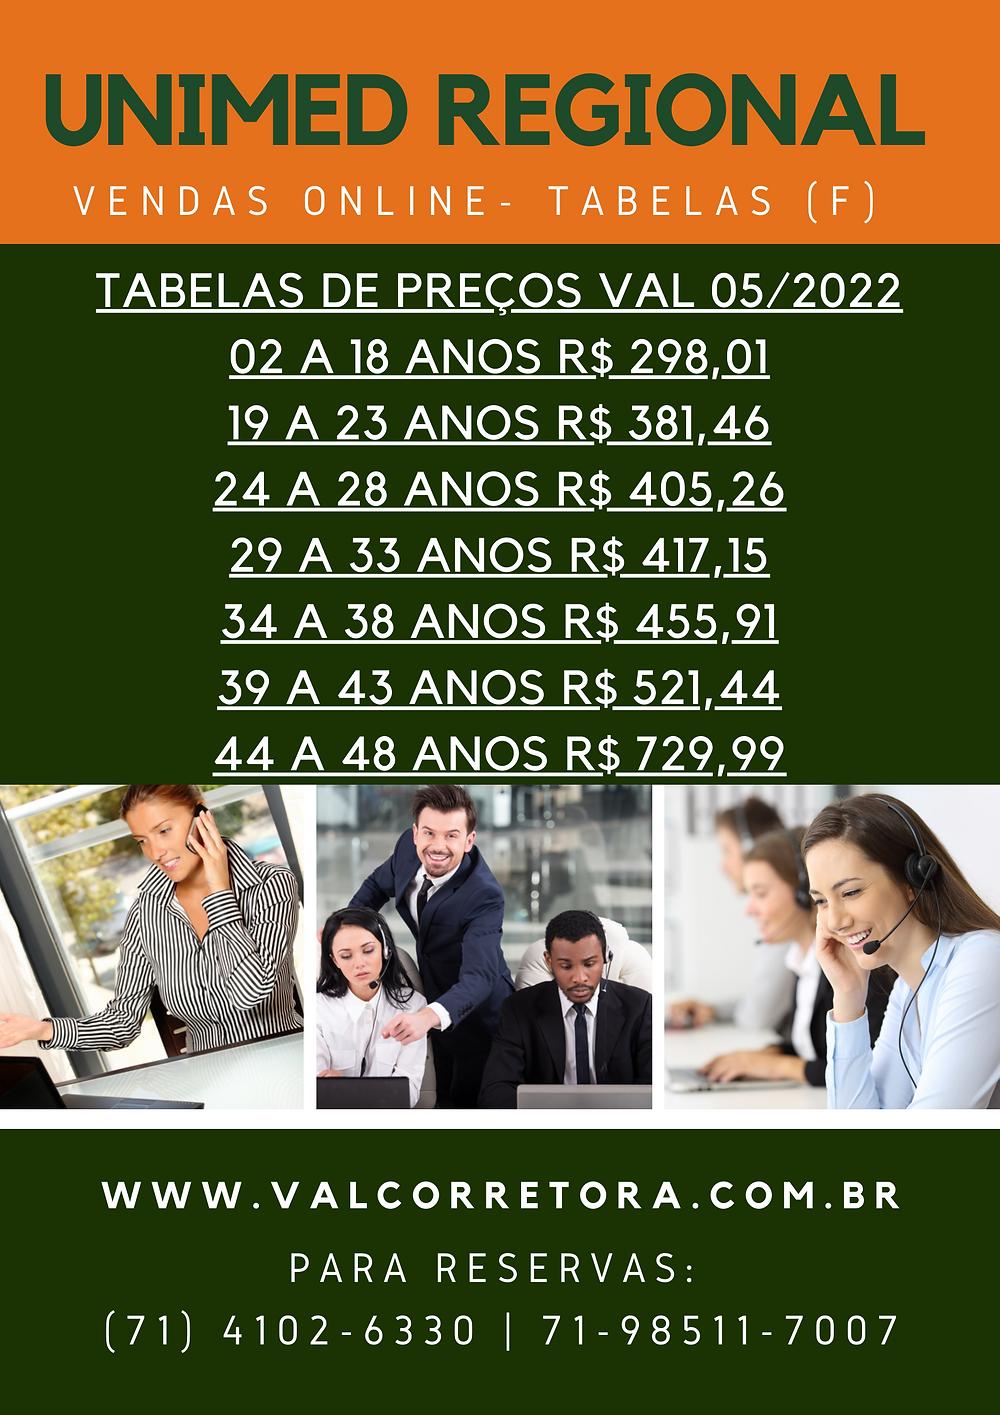 Salvador Tabelas Unimed Classico Regional